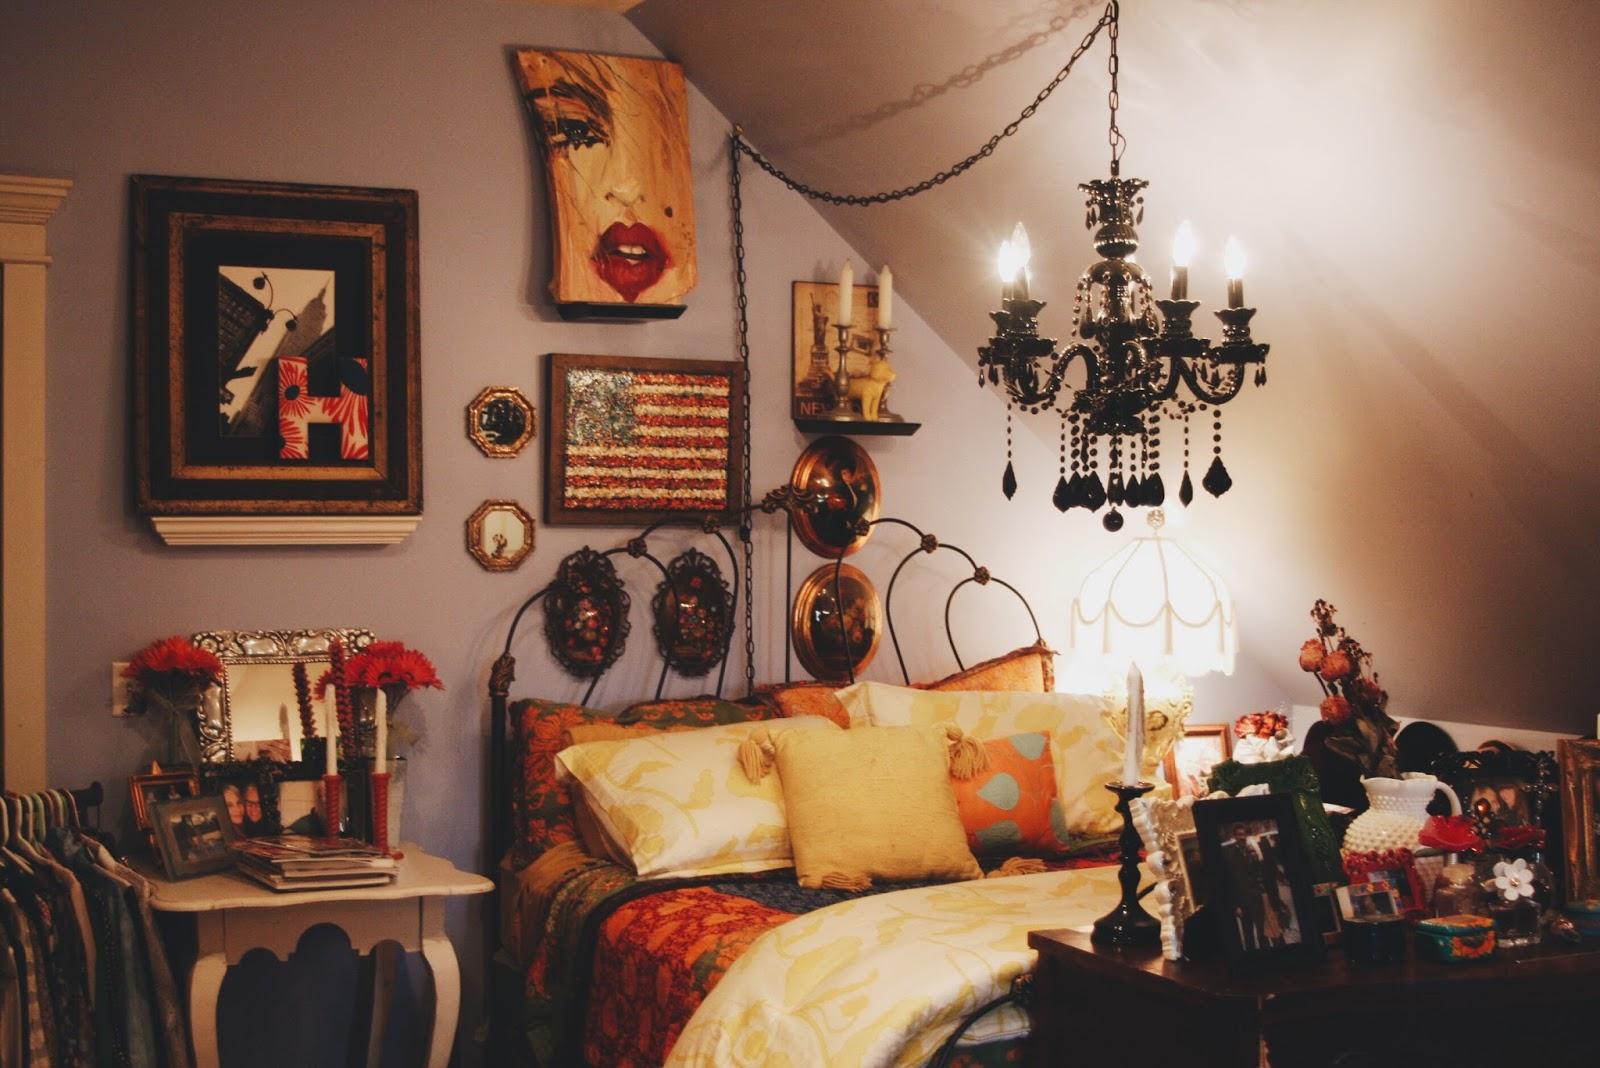 A Look Inside My Room | Styles by Hannah Riles